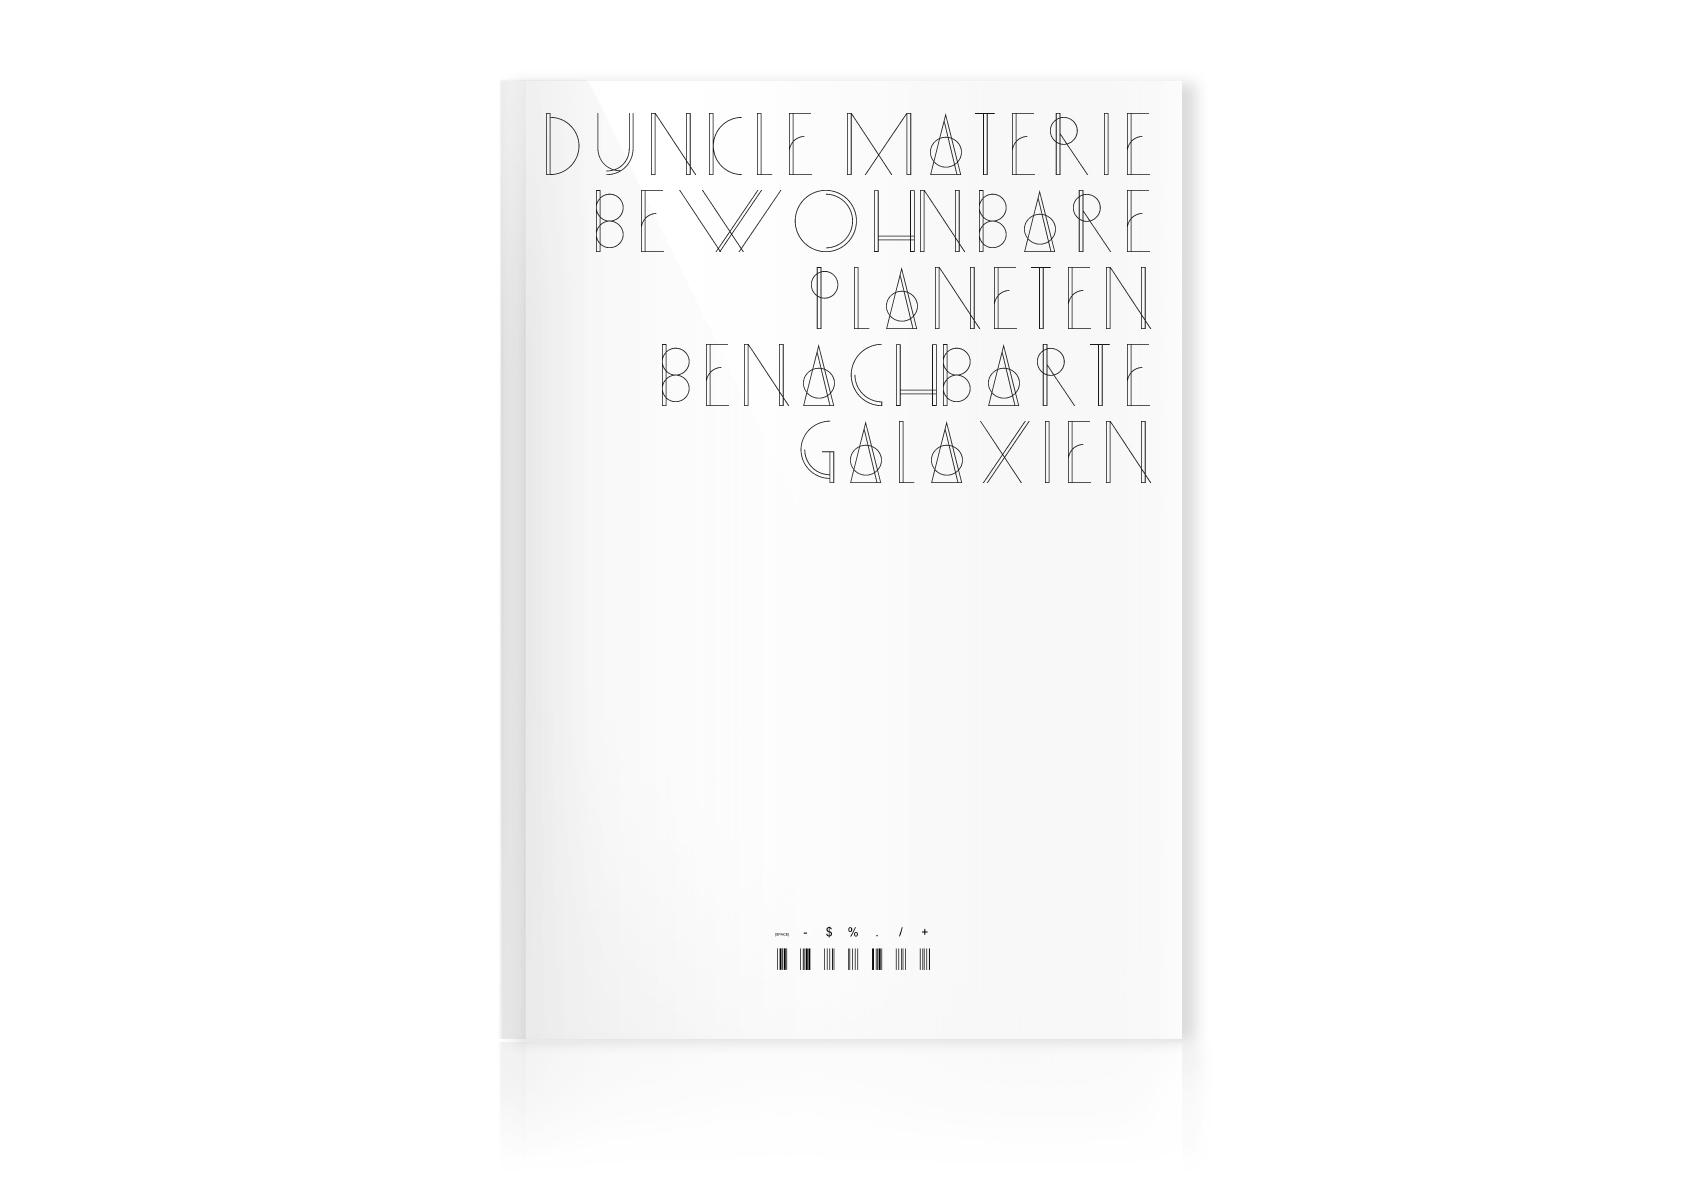 Back-Cover_Cosmos-Magazin_hsrm-Hochschule-RheinMain_Editorial-Design_Grafikdesign_Gloria-Kison.jpg